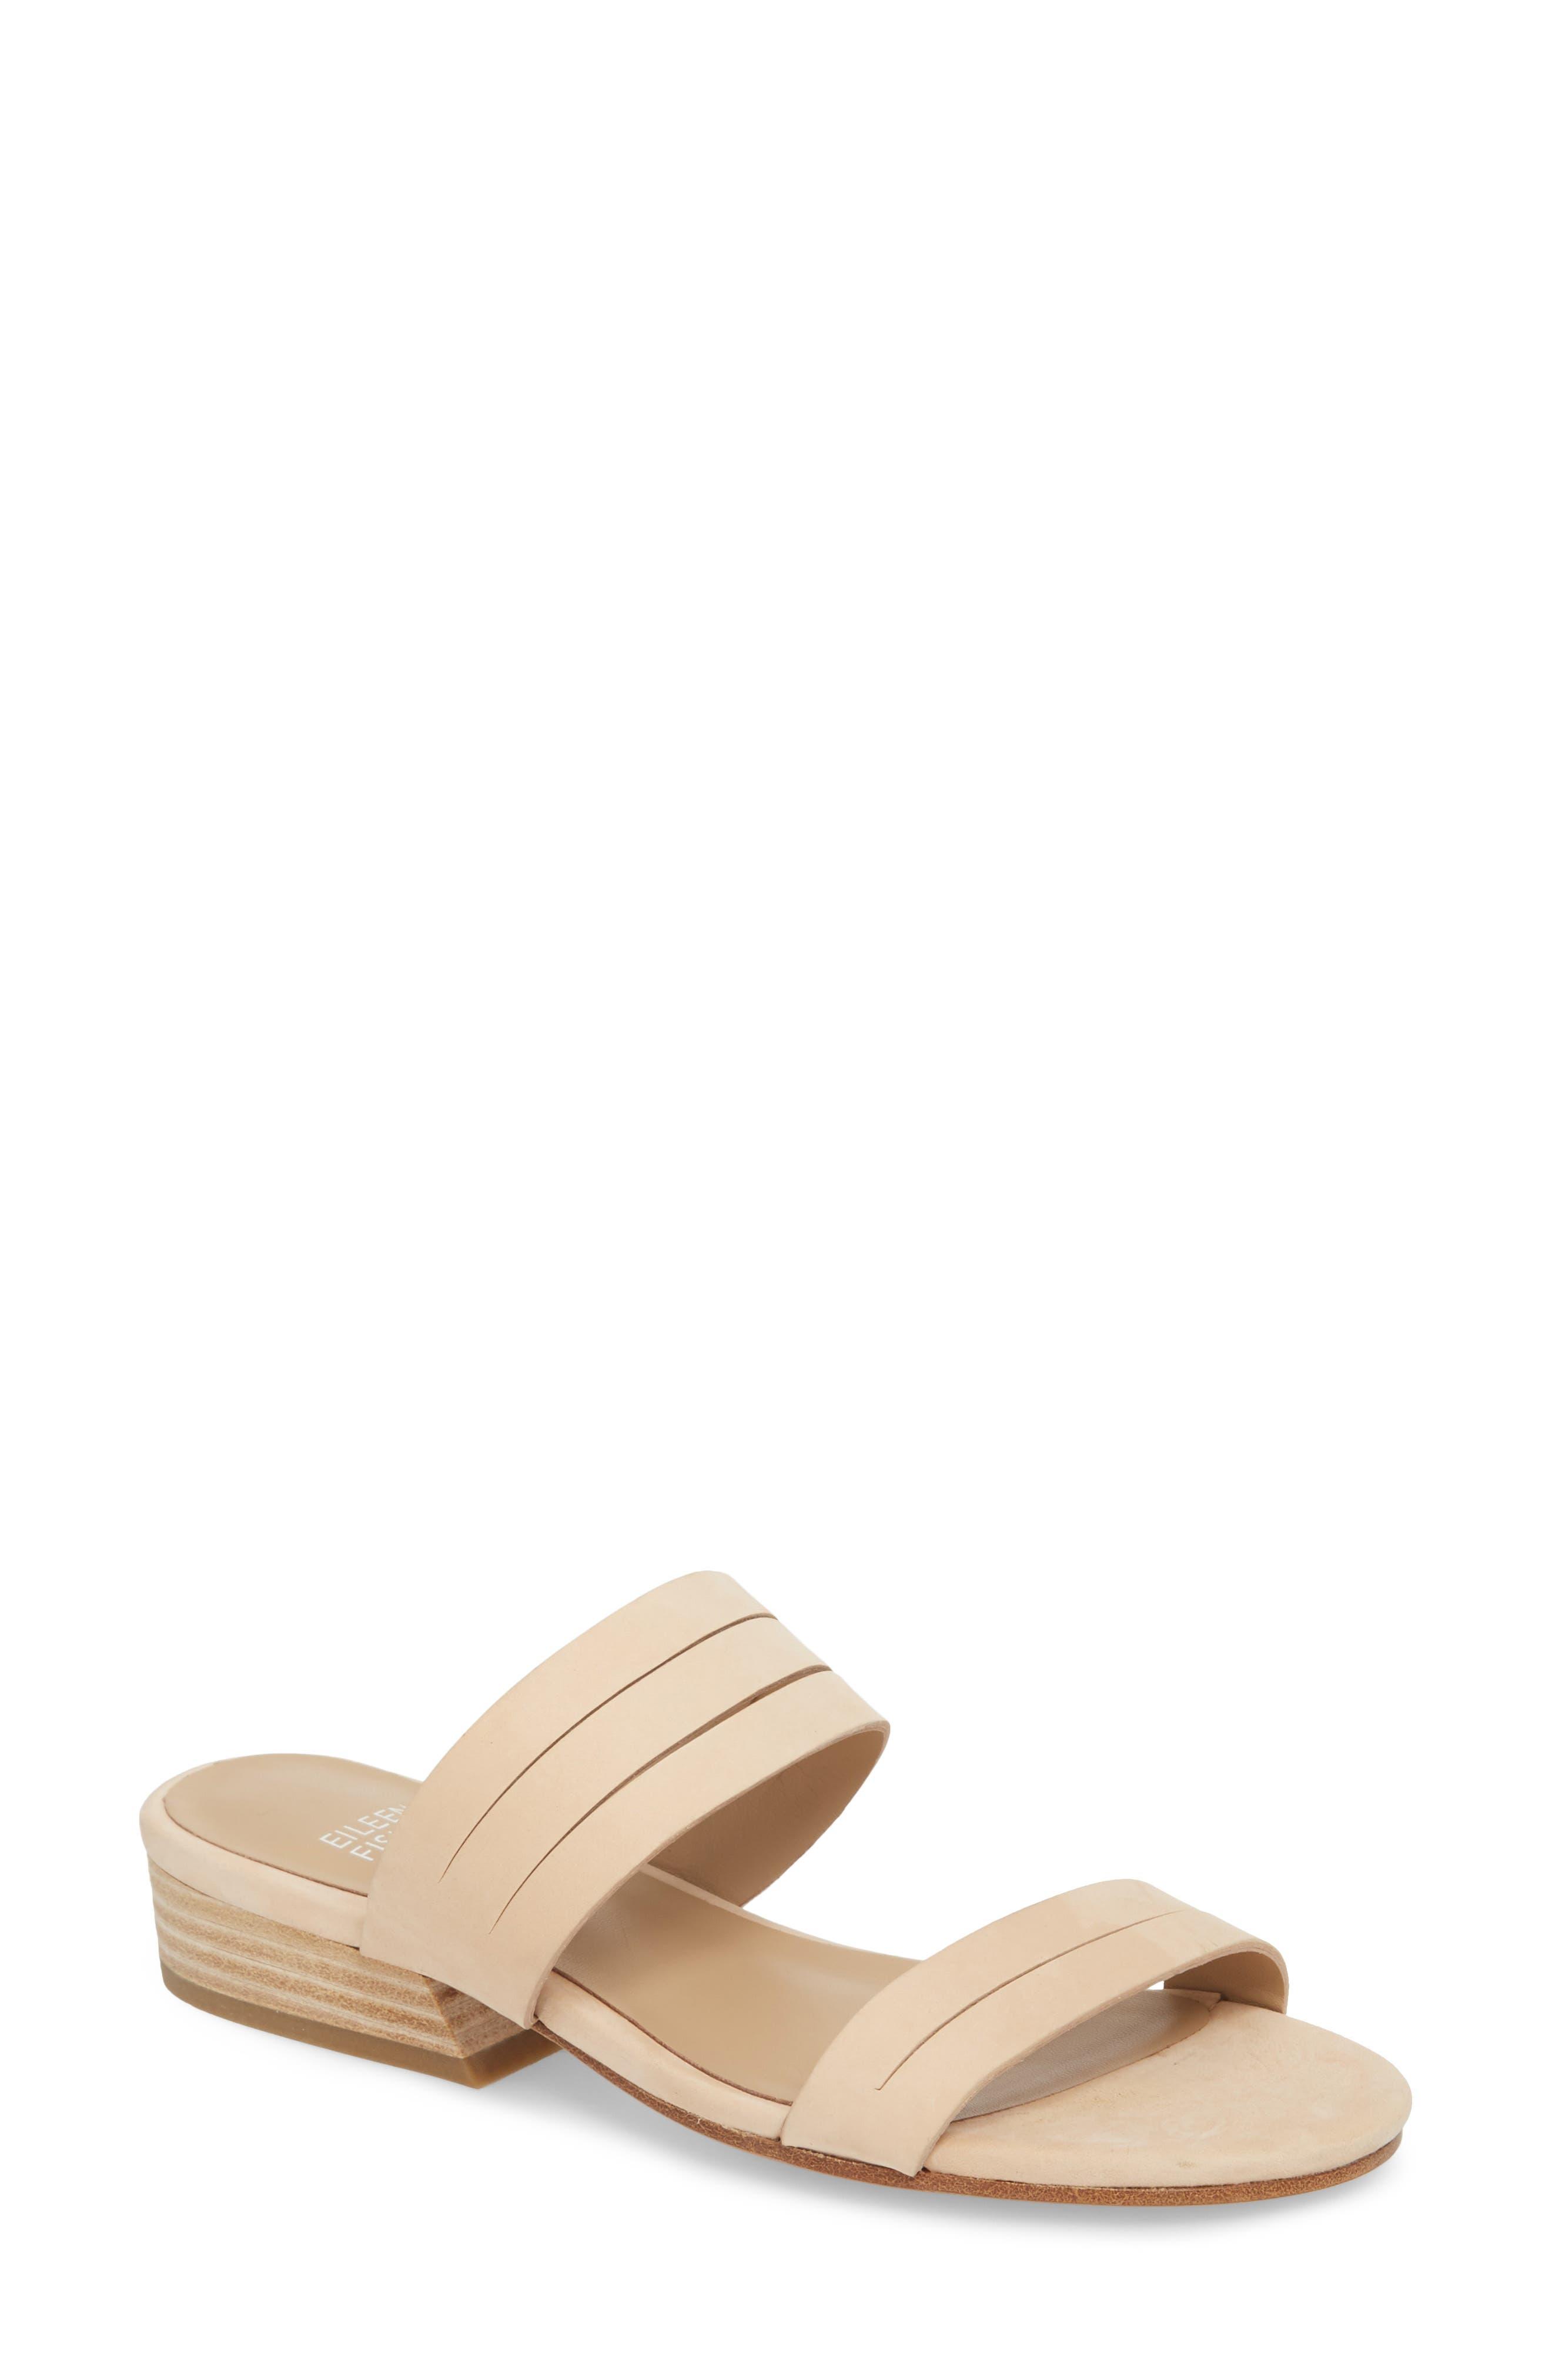 Finch Slide Sandal,                         Main,                         color, Cream Nubuck